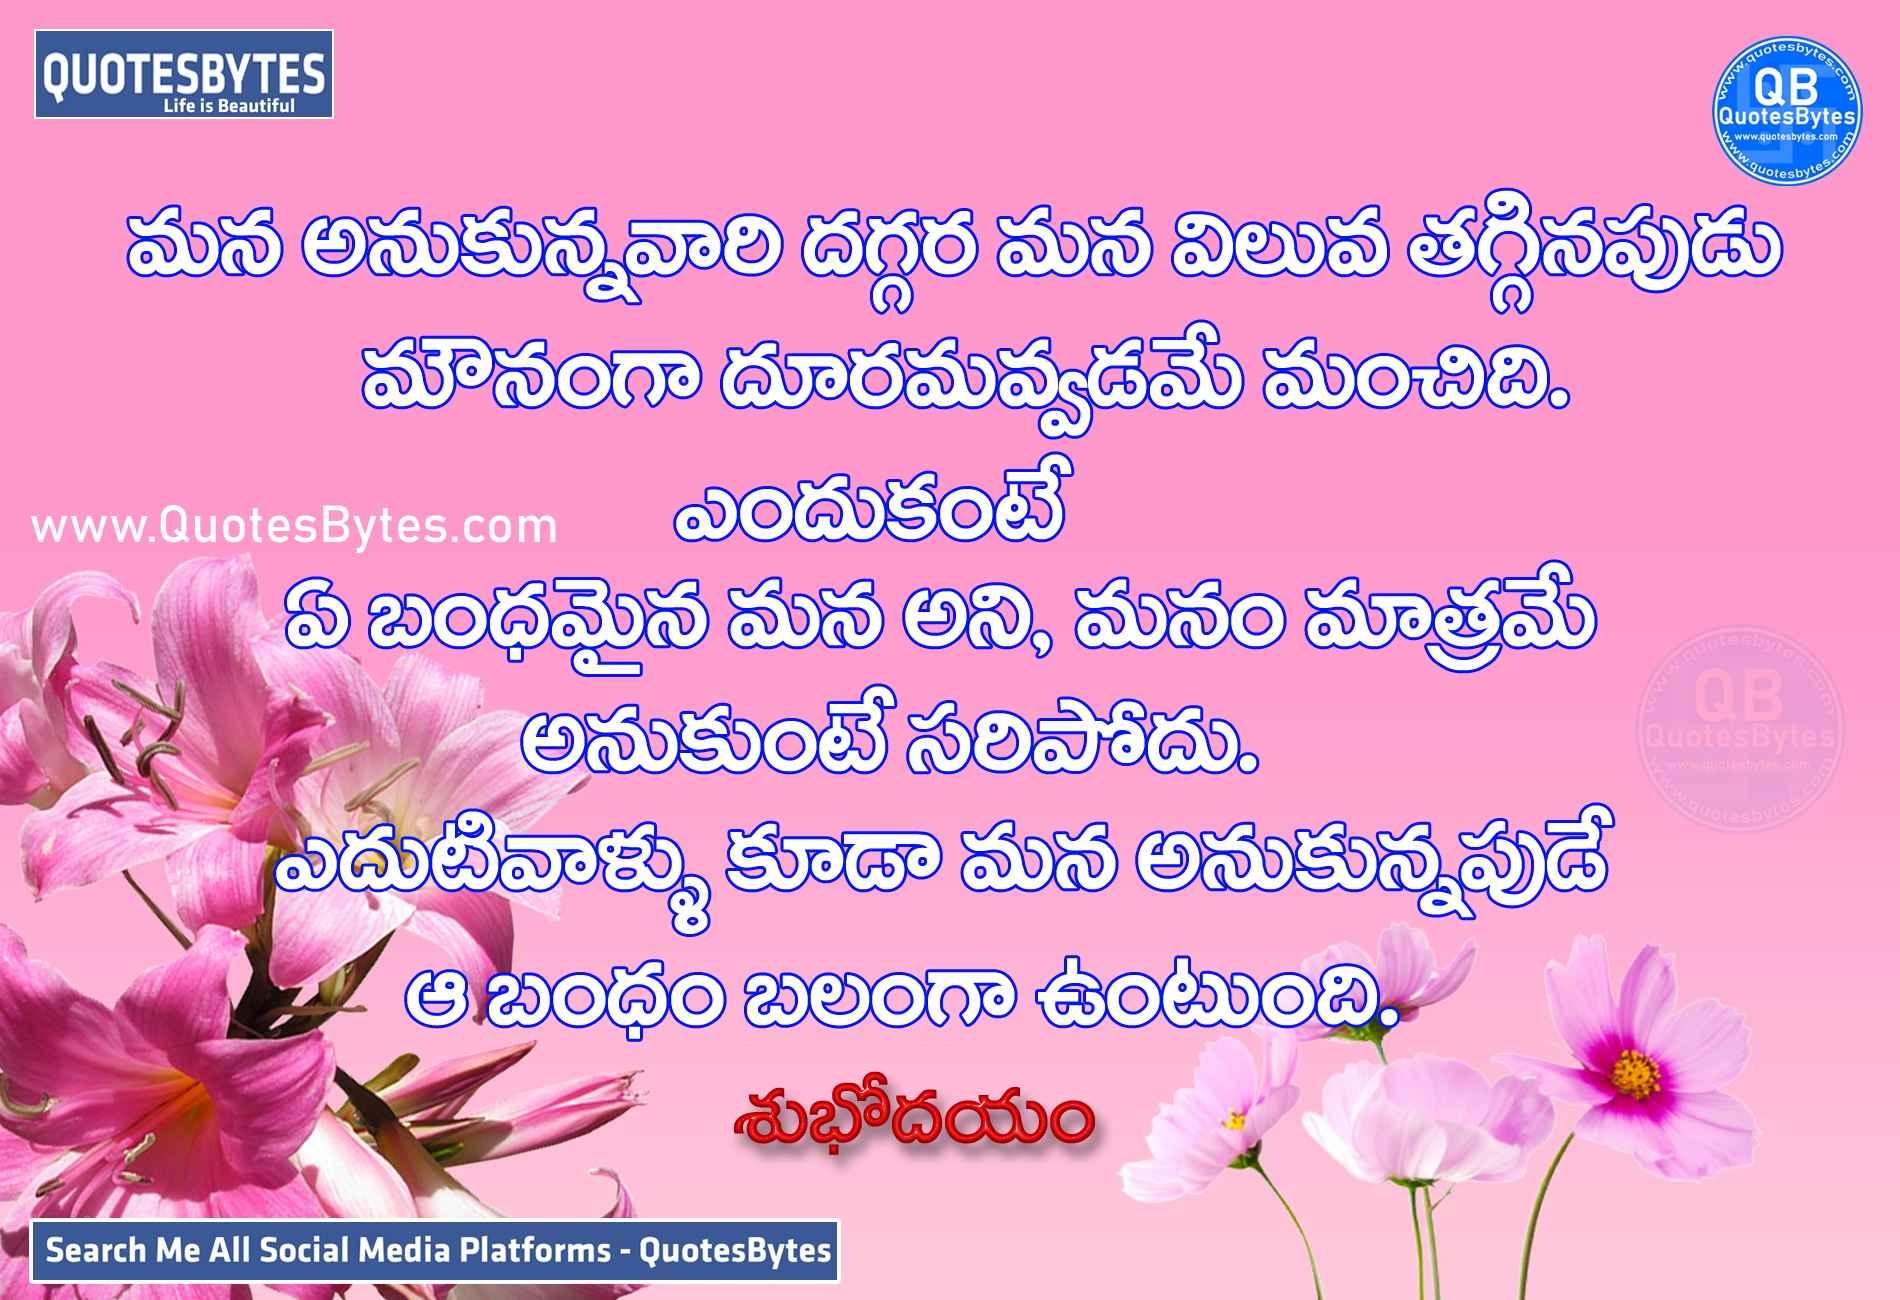 good morning images in telugu-Image of Inspirational Good Morning Quotes in Telugu